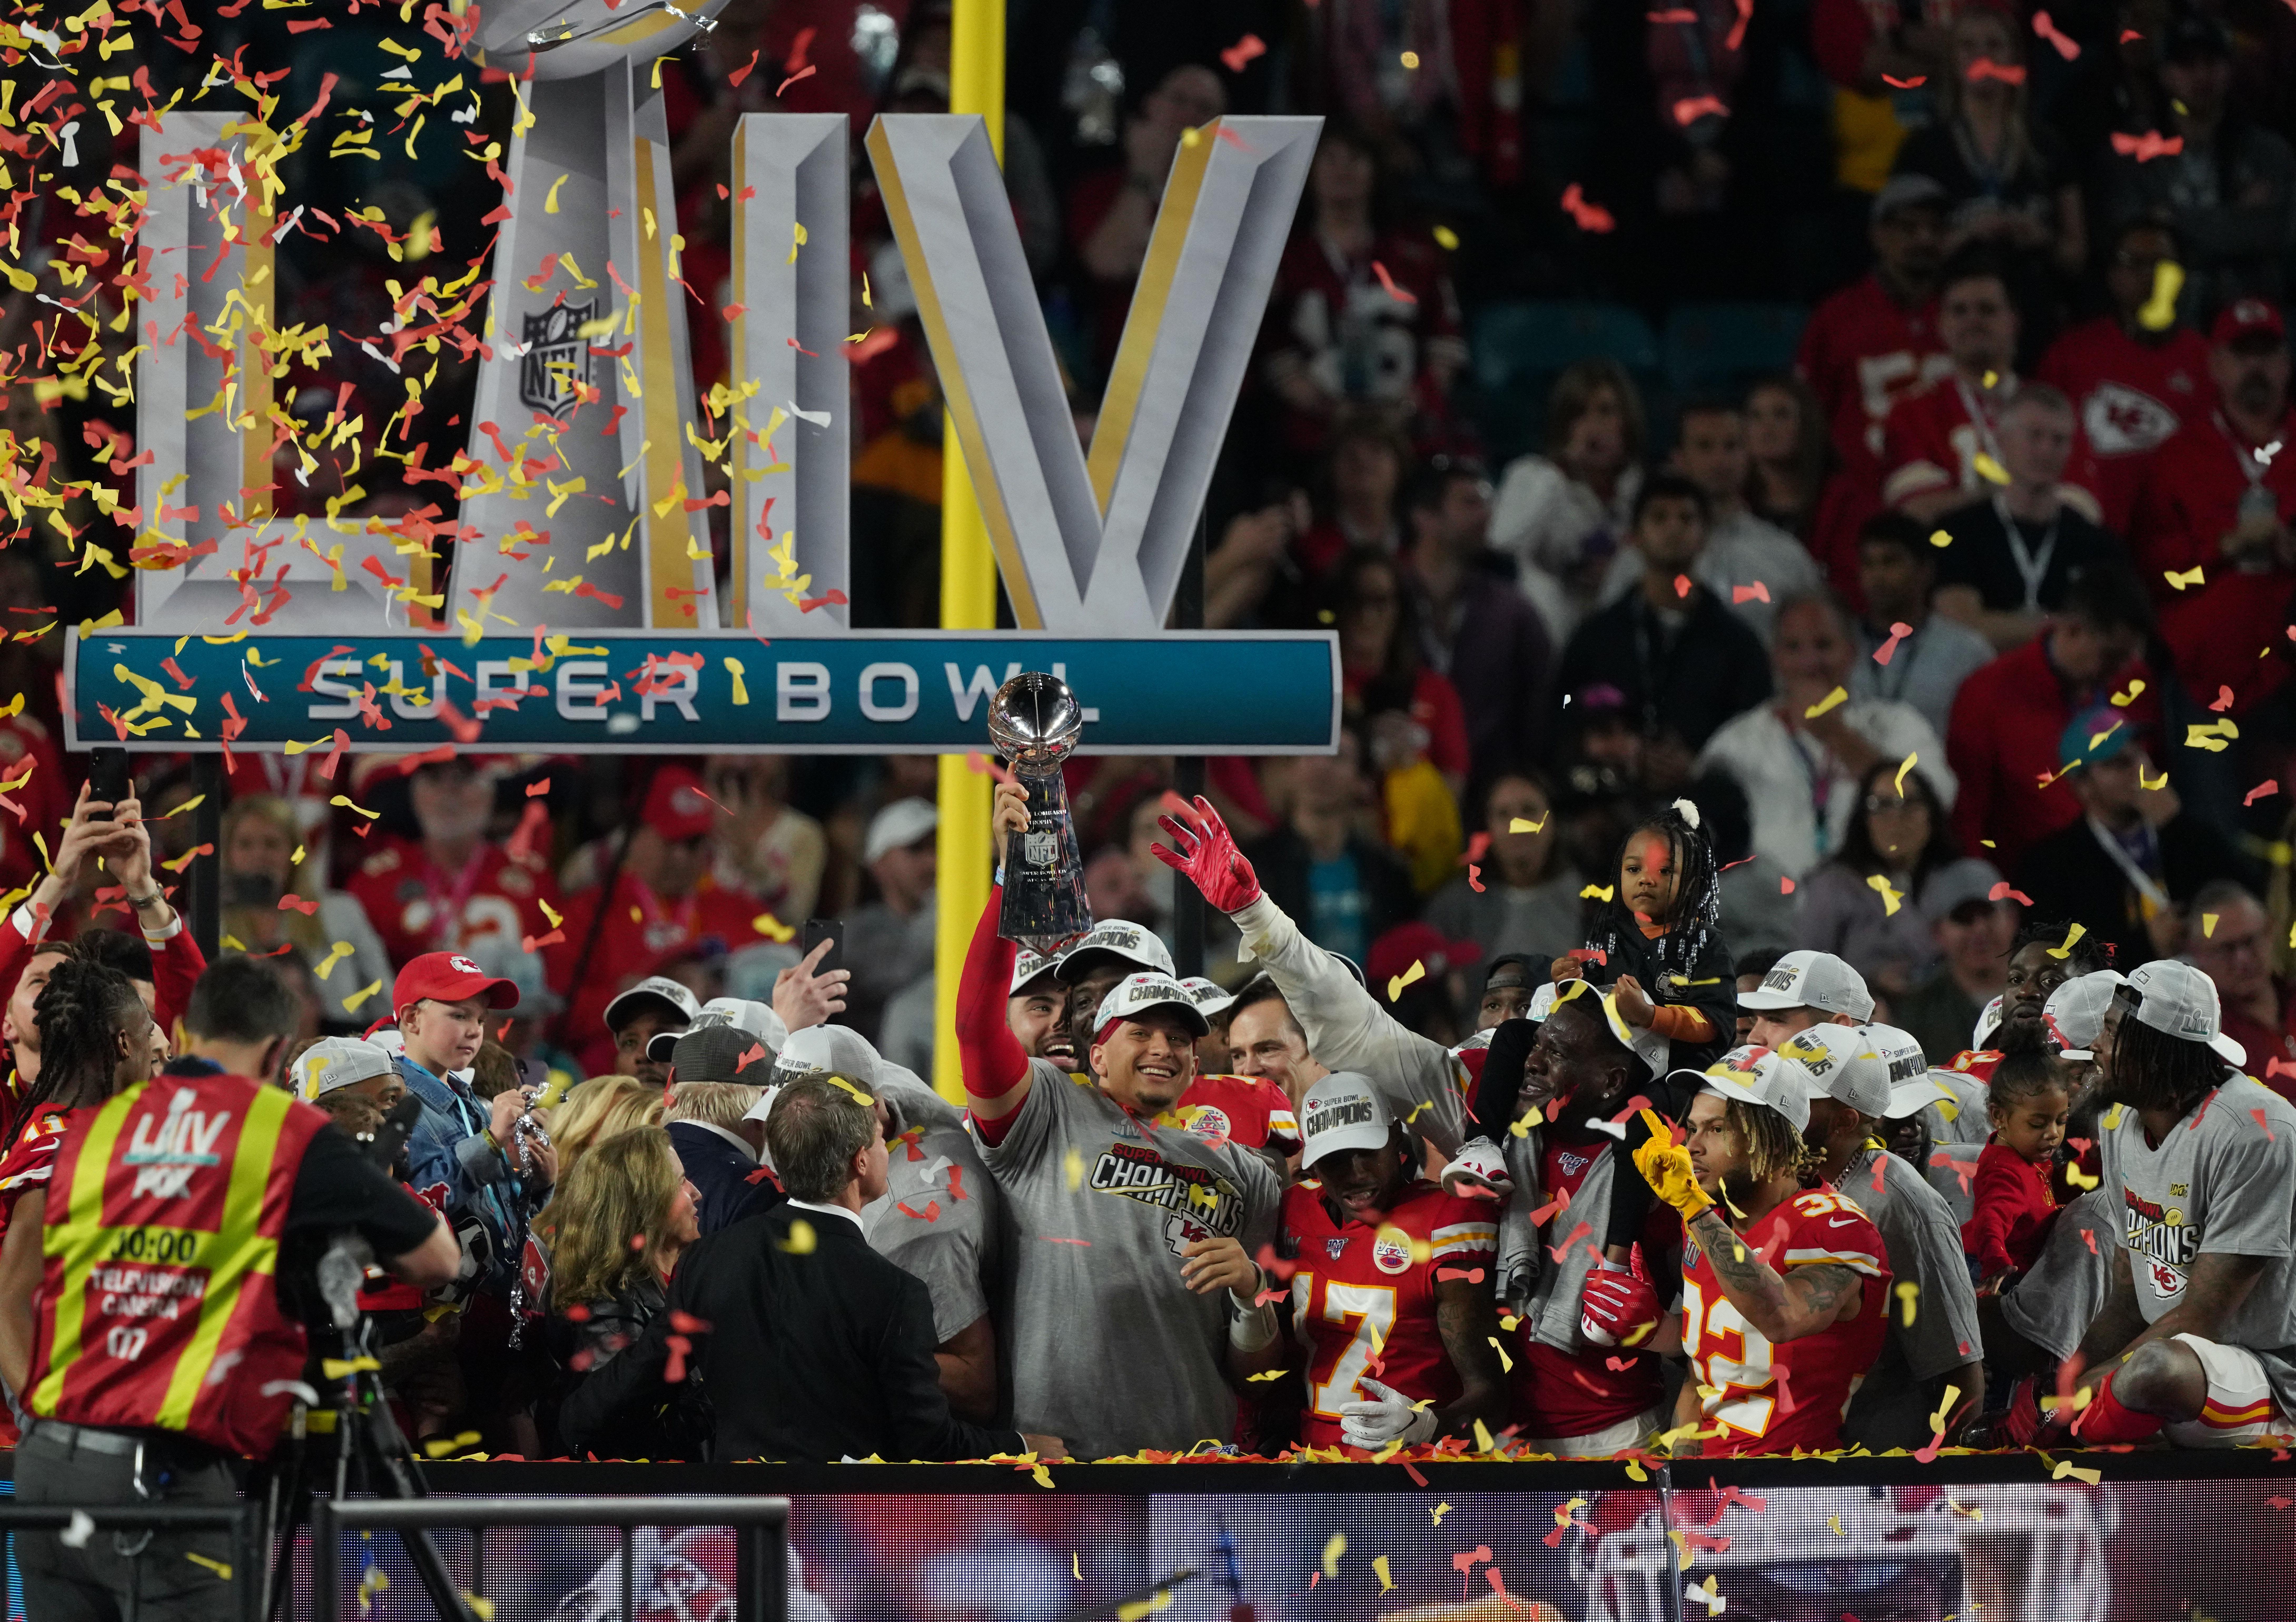 NFL: Super Bowl LIV-San Francisco 49ers vs Kansas City Chiefs